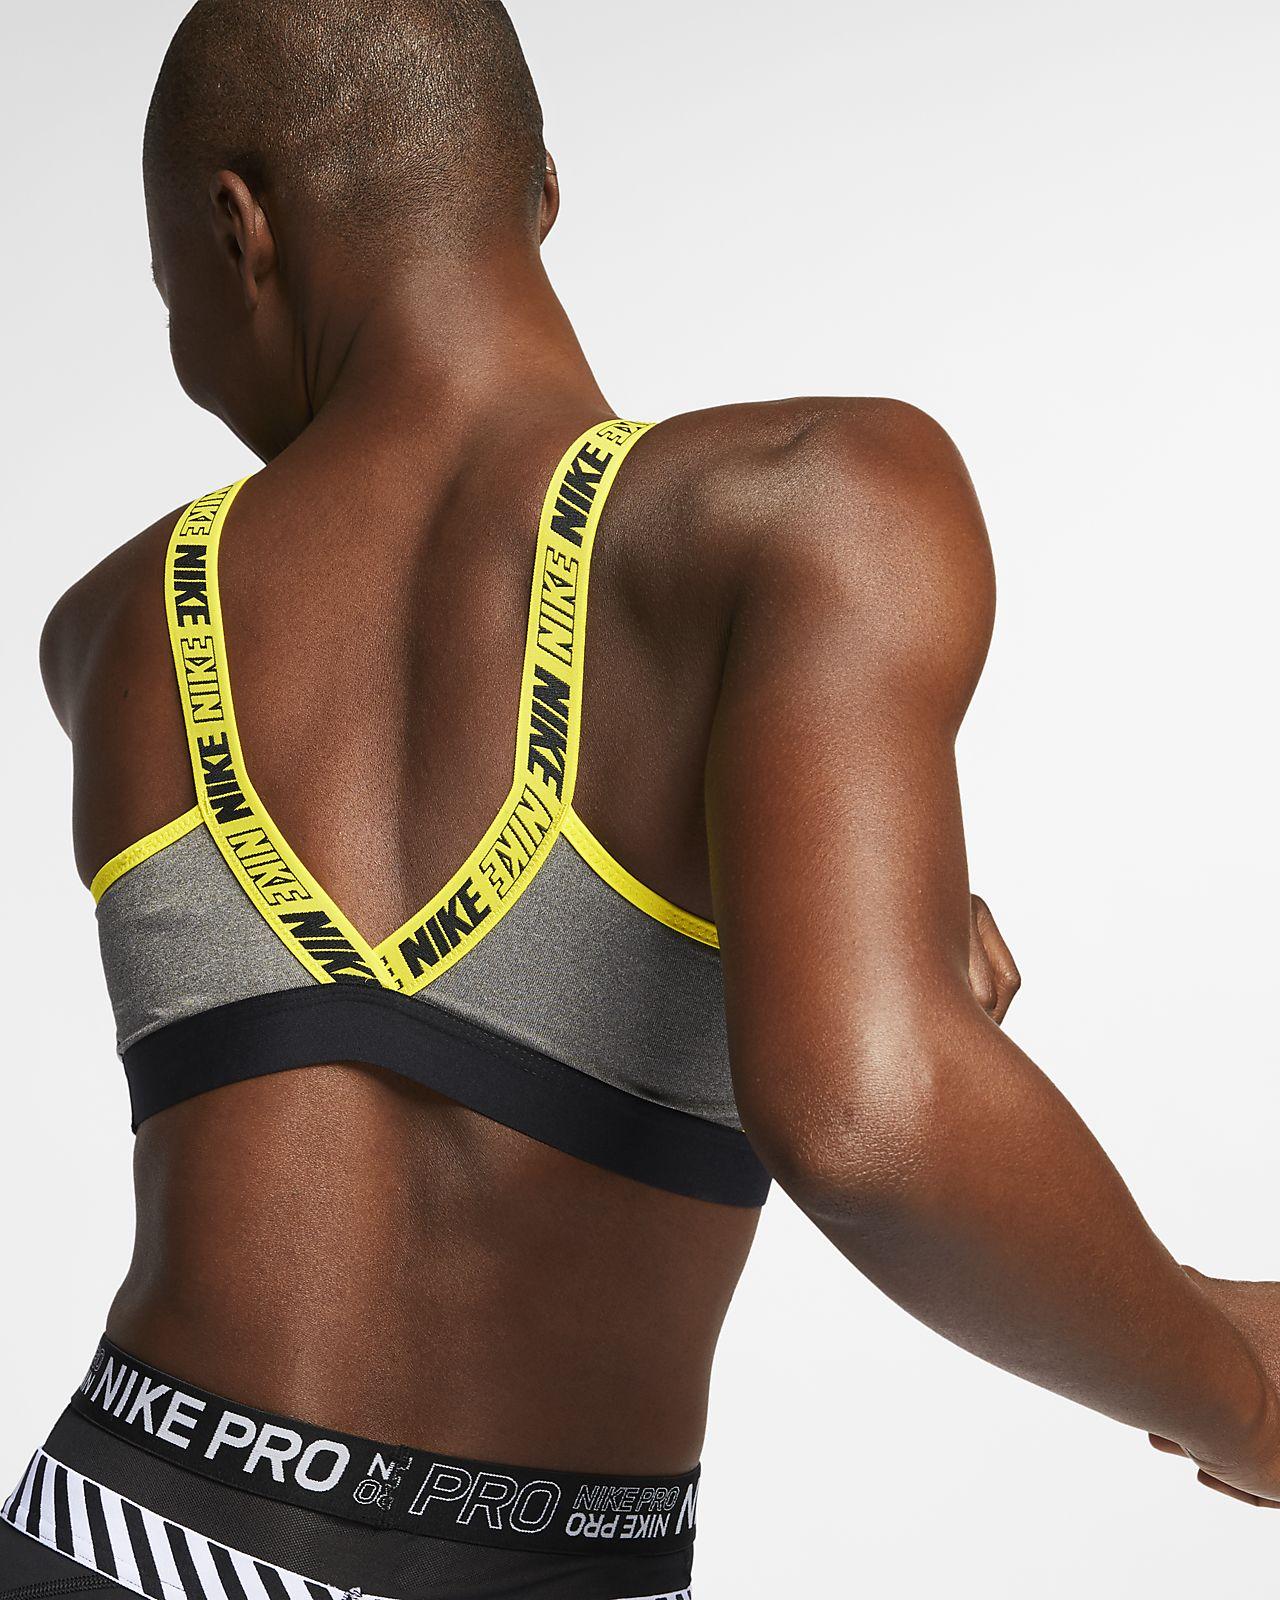 Nike Classic Women's Medium-Support Sports Bra